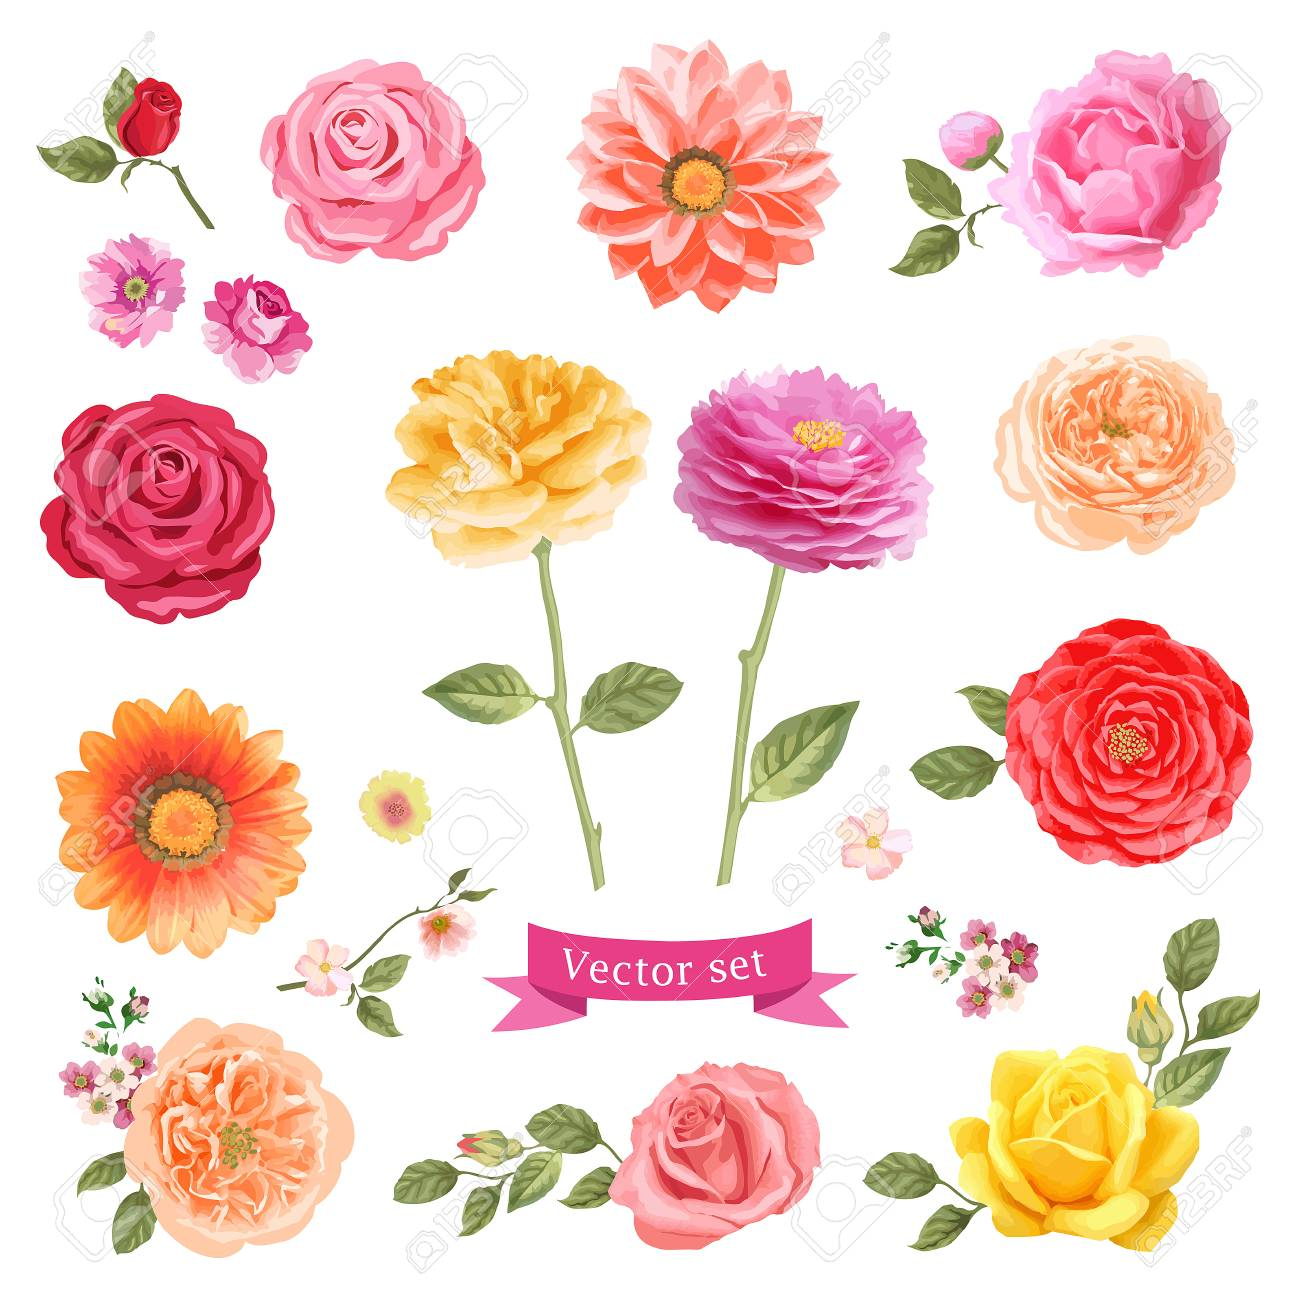 Set Of Vector Flowers Frame Design Elements Stock